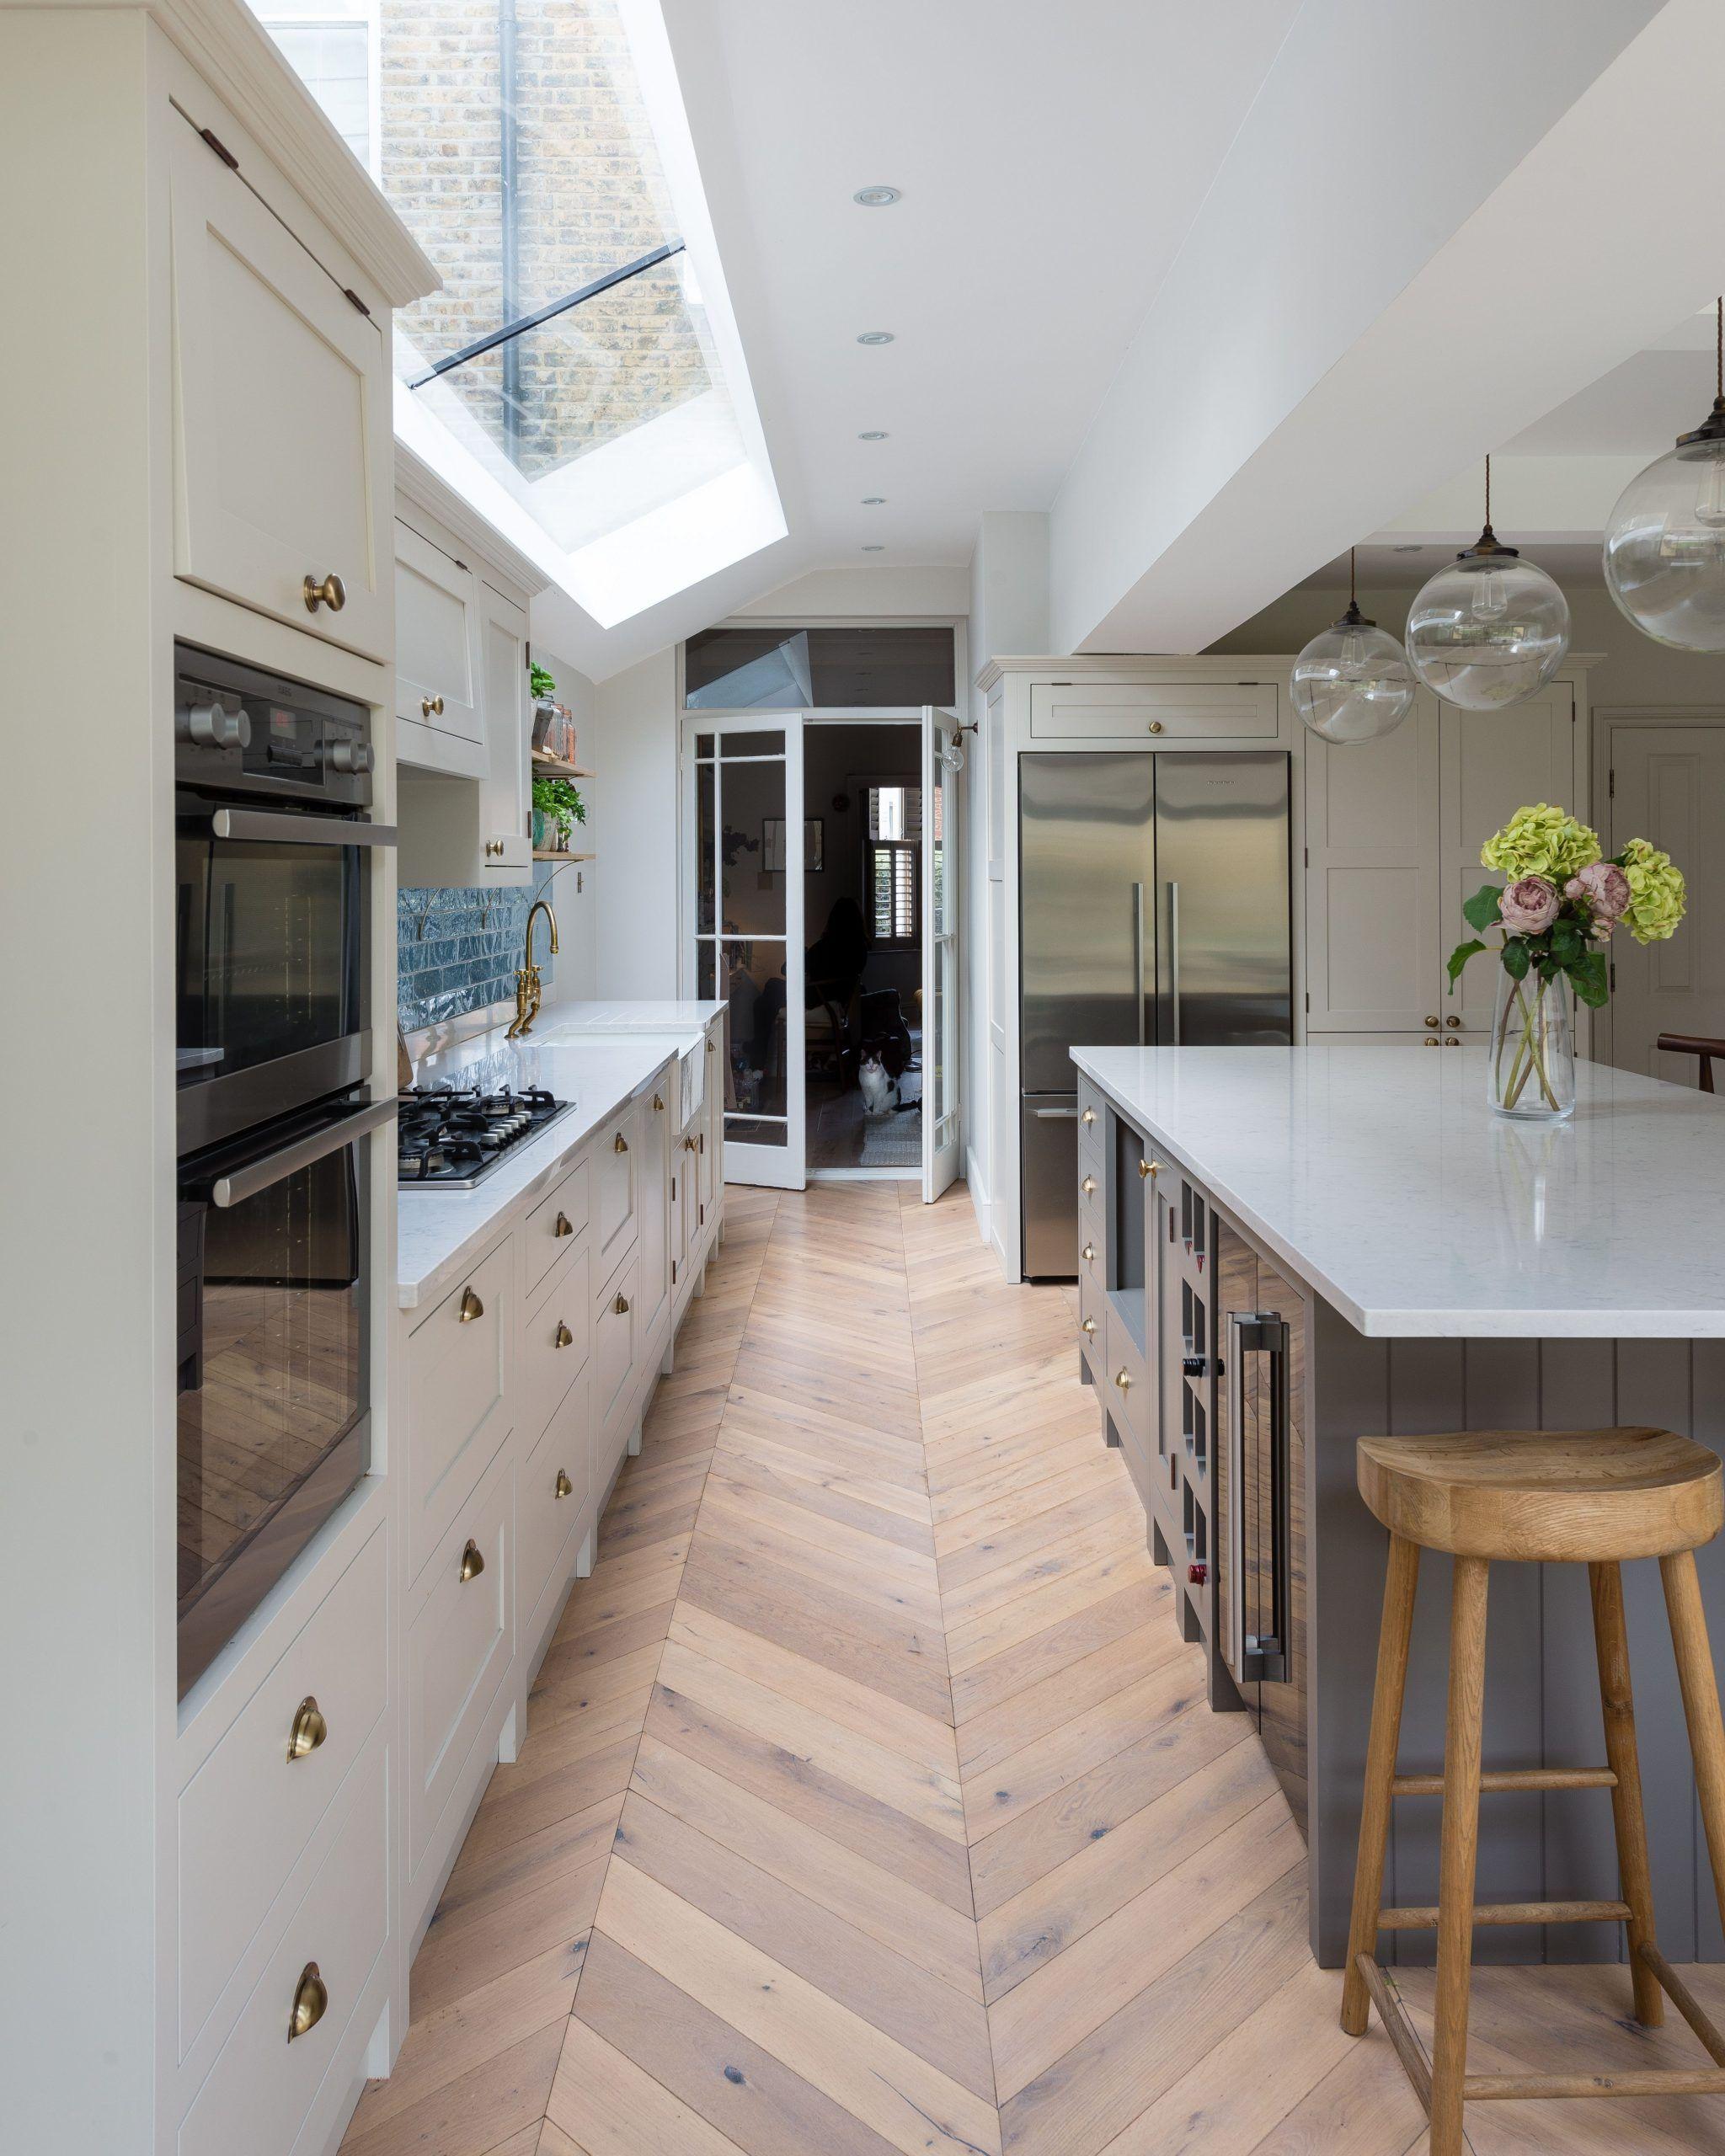 Backsplash Kitchen Design Online Kitchen Design Small Kitchen Design Images 20 In 2020 Open Plan Kitchen Living Room Kitchen Design Open Plan Kitchen Dining Living